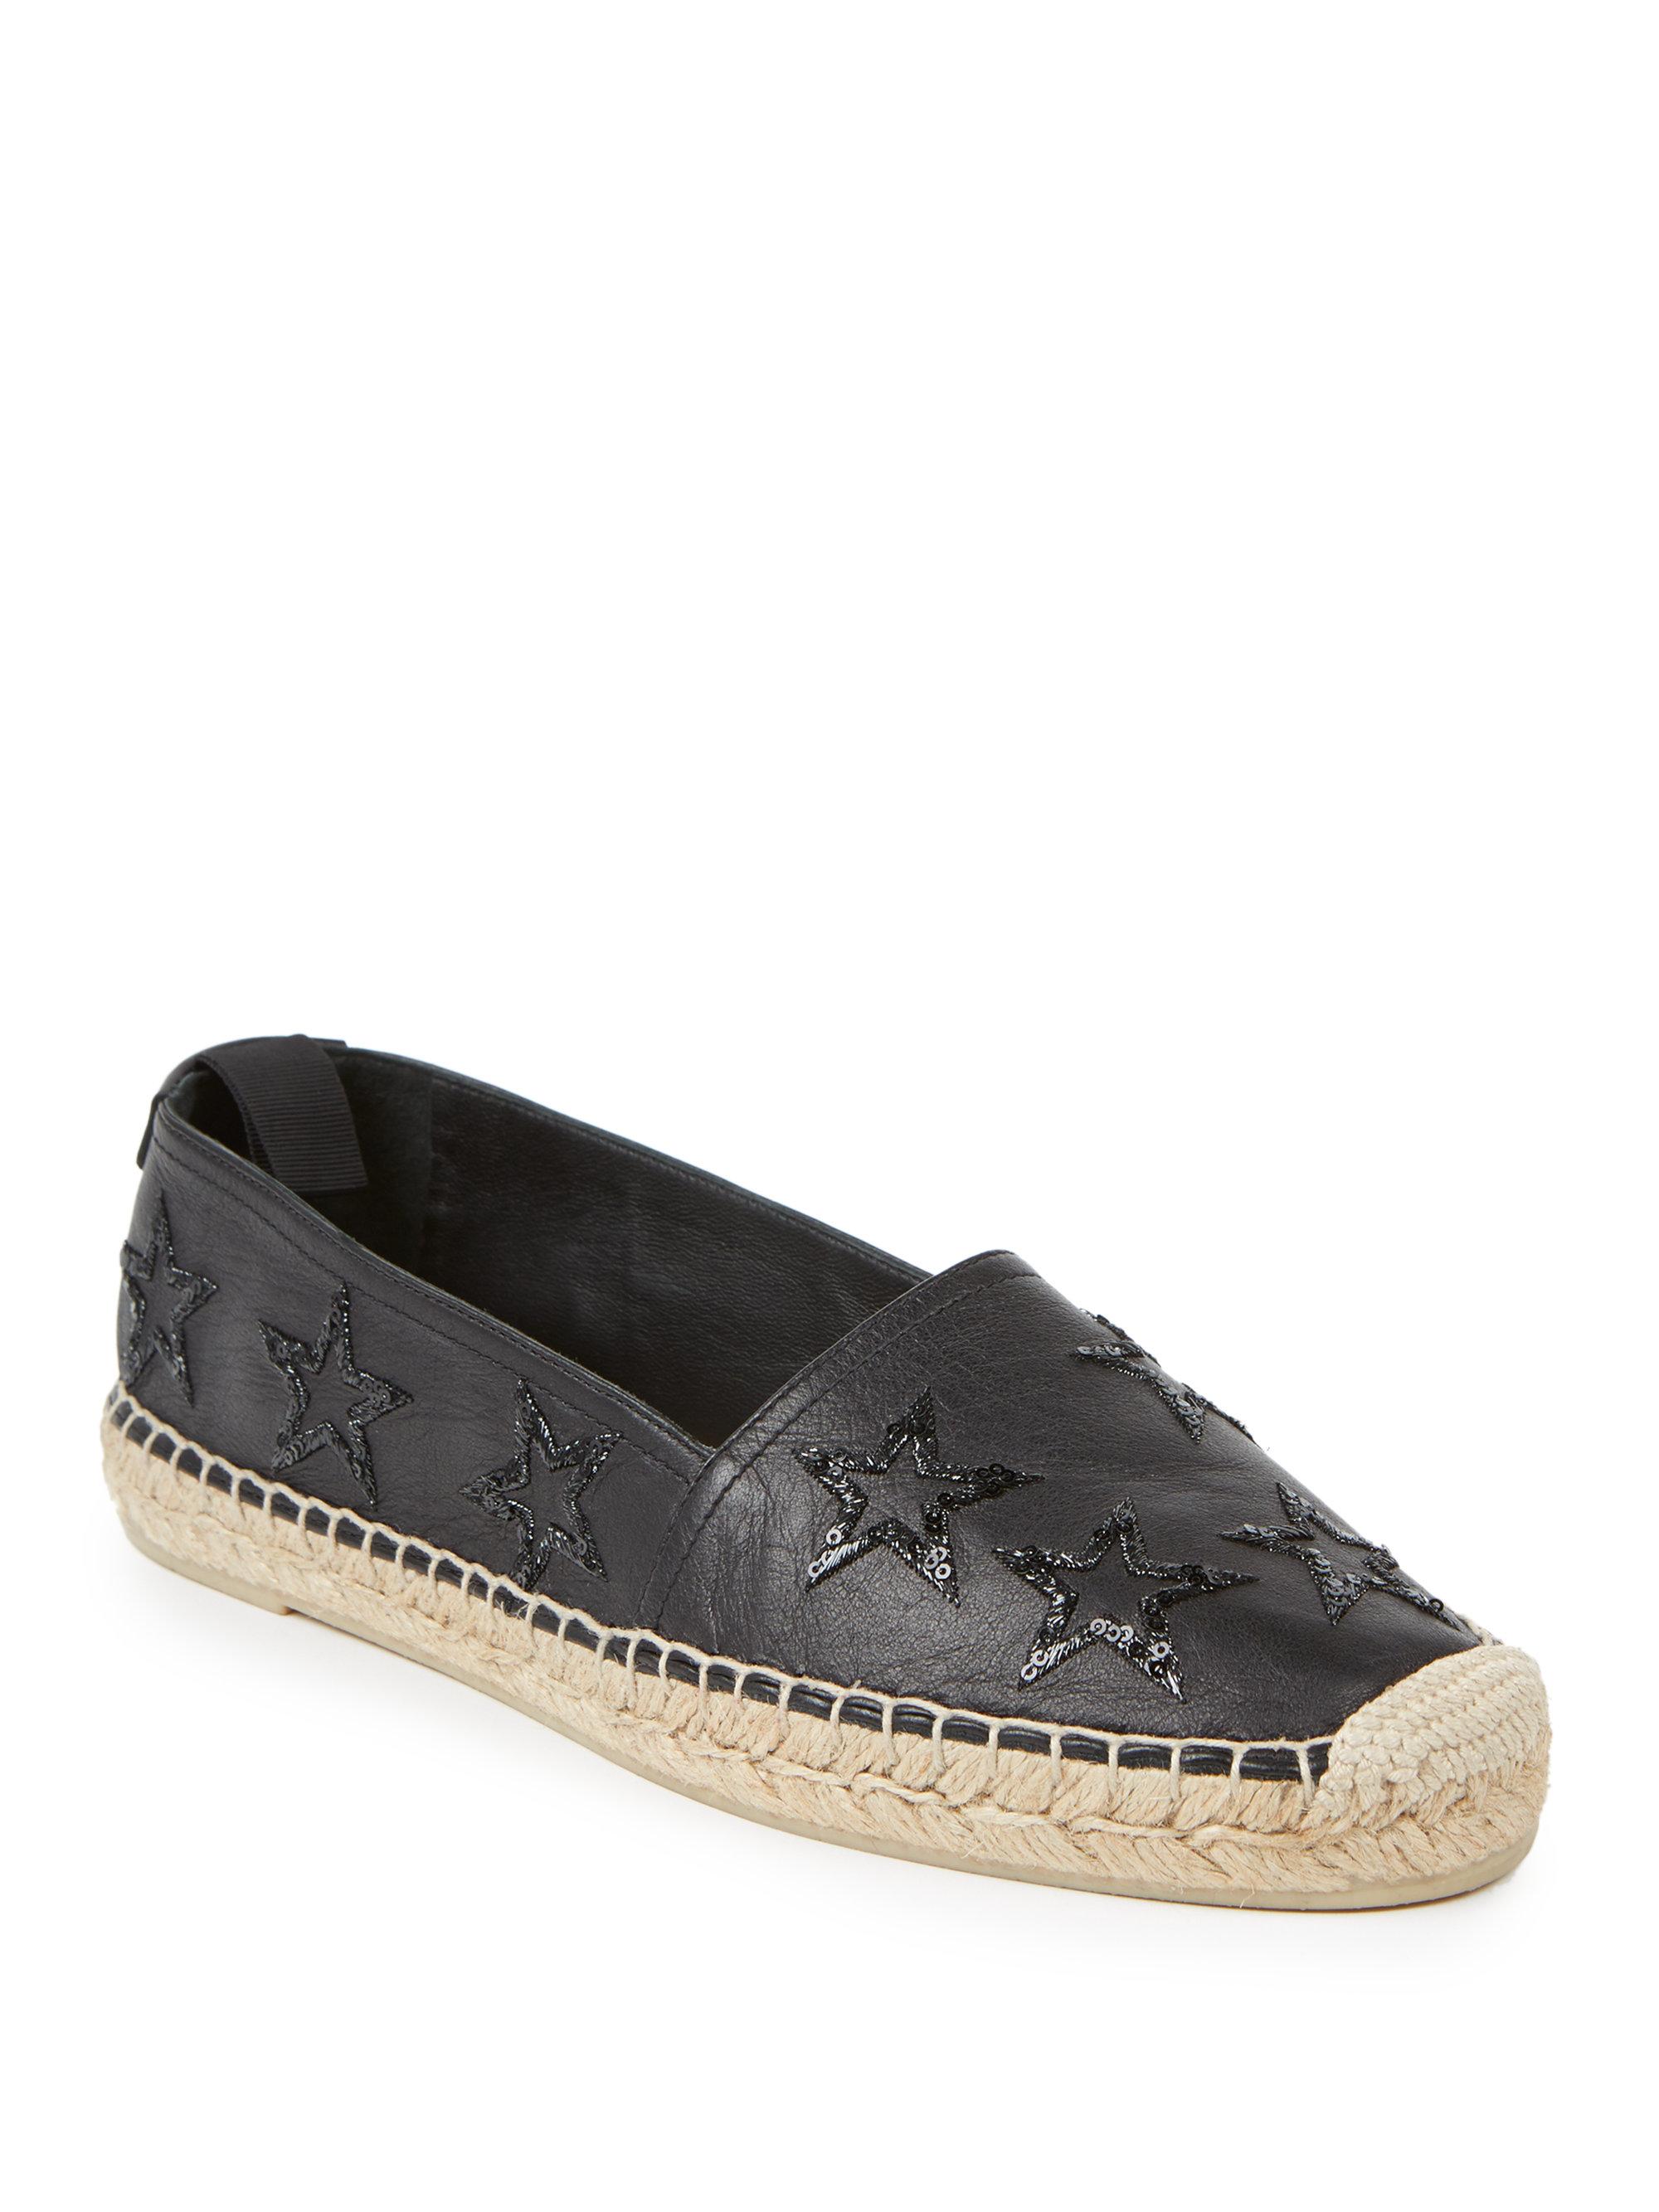 embroidered lace-up espadrilles - Black Saint Laurent O6JYchDIl